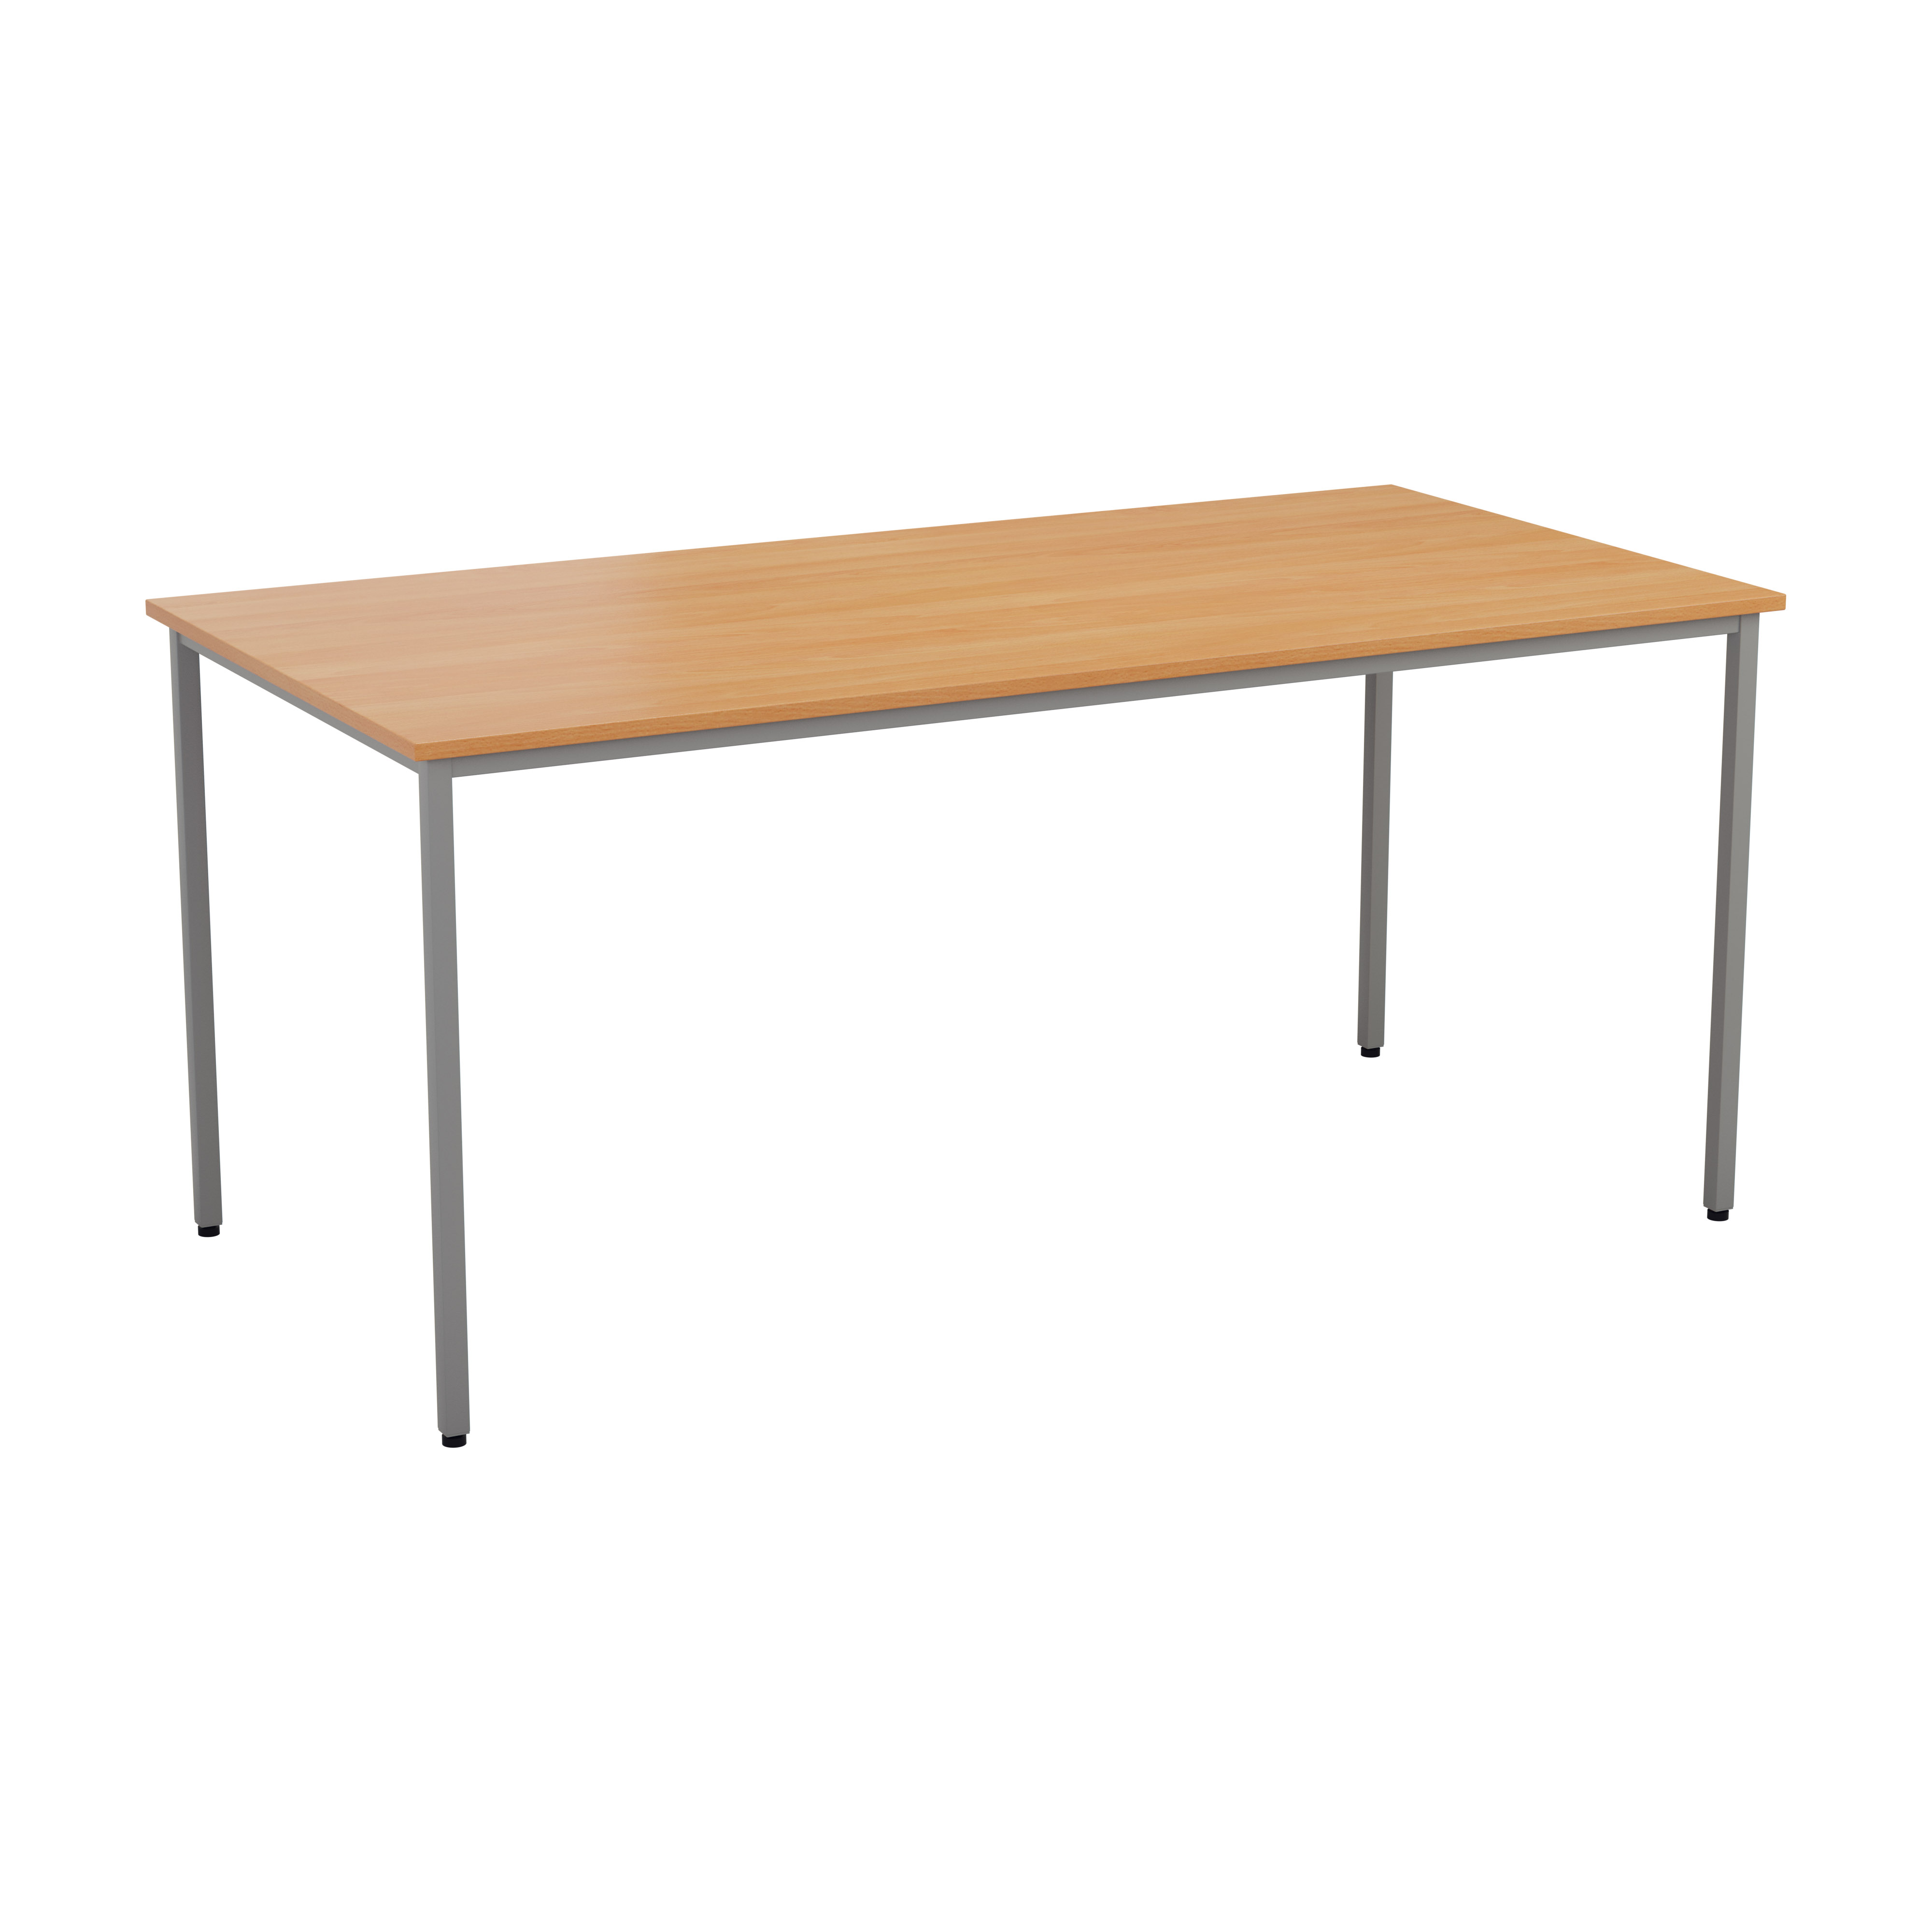 1200mm Rectangular Multipurpose Table